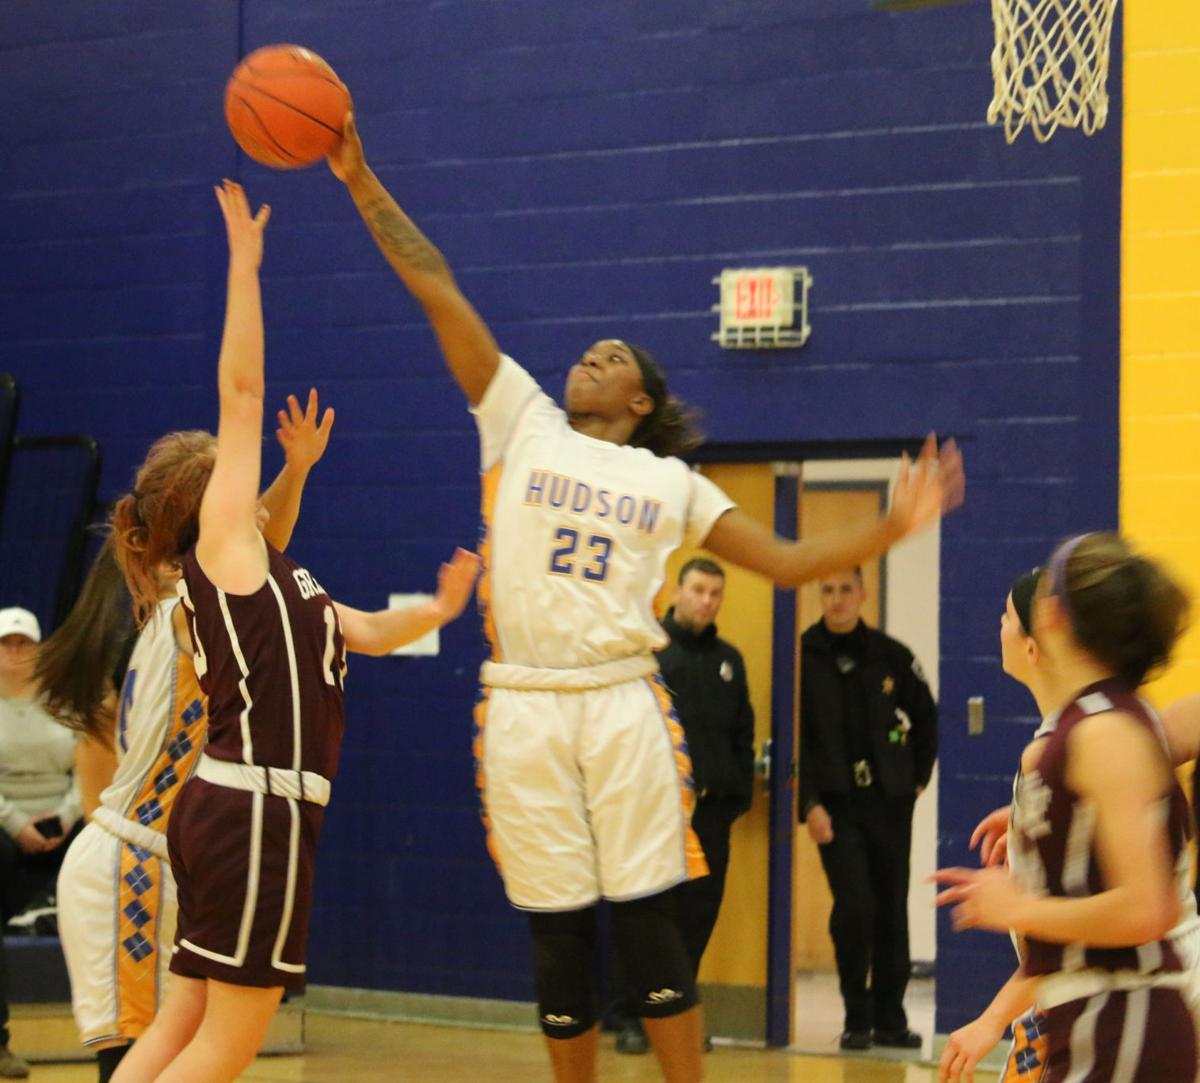 Hudson, Maple Hill girls earn Patroon victories